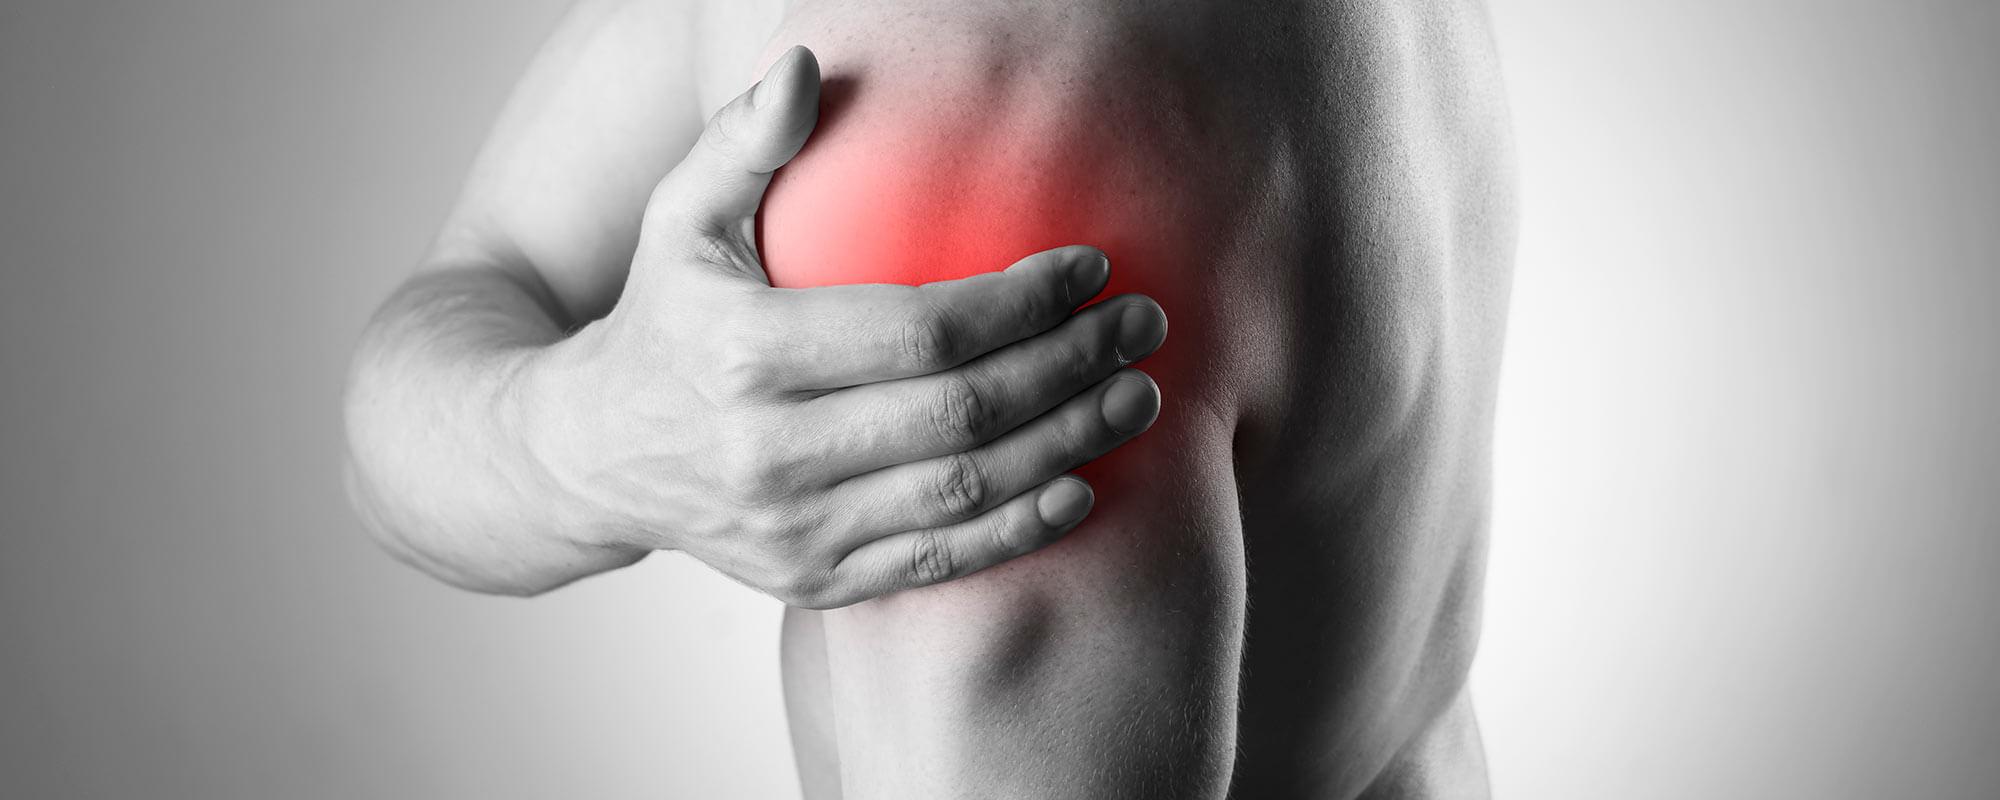 Dolor de hombro Fisioterapia a domicilio